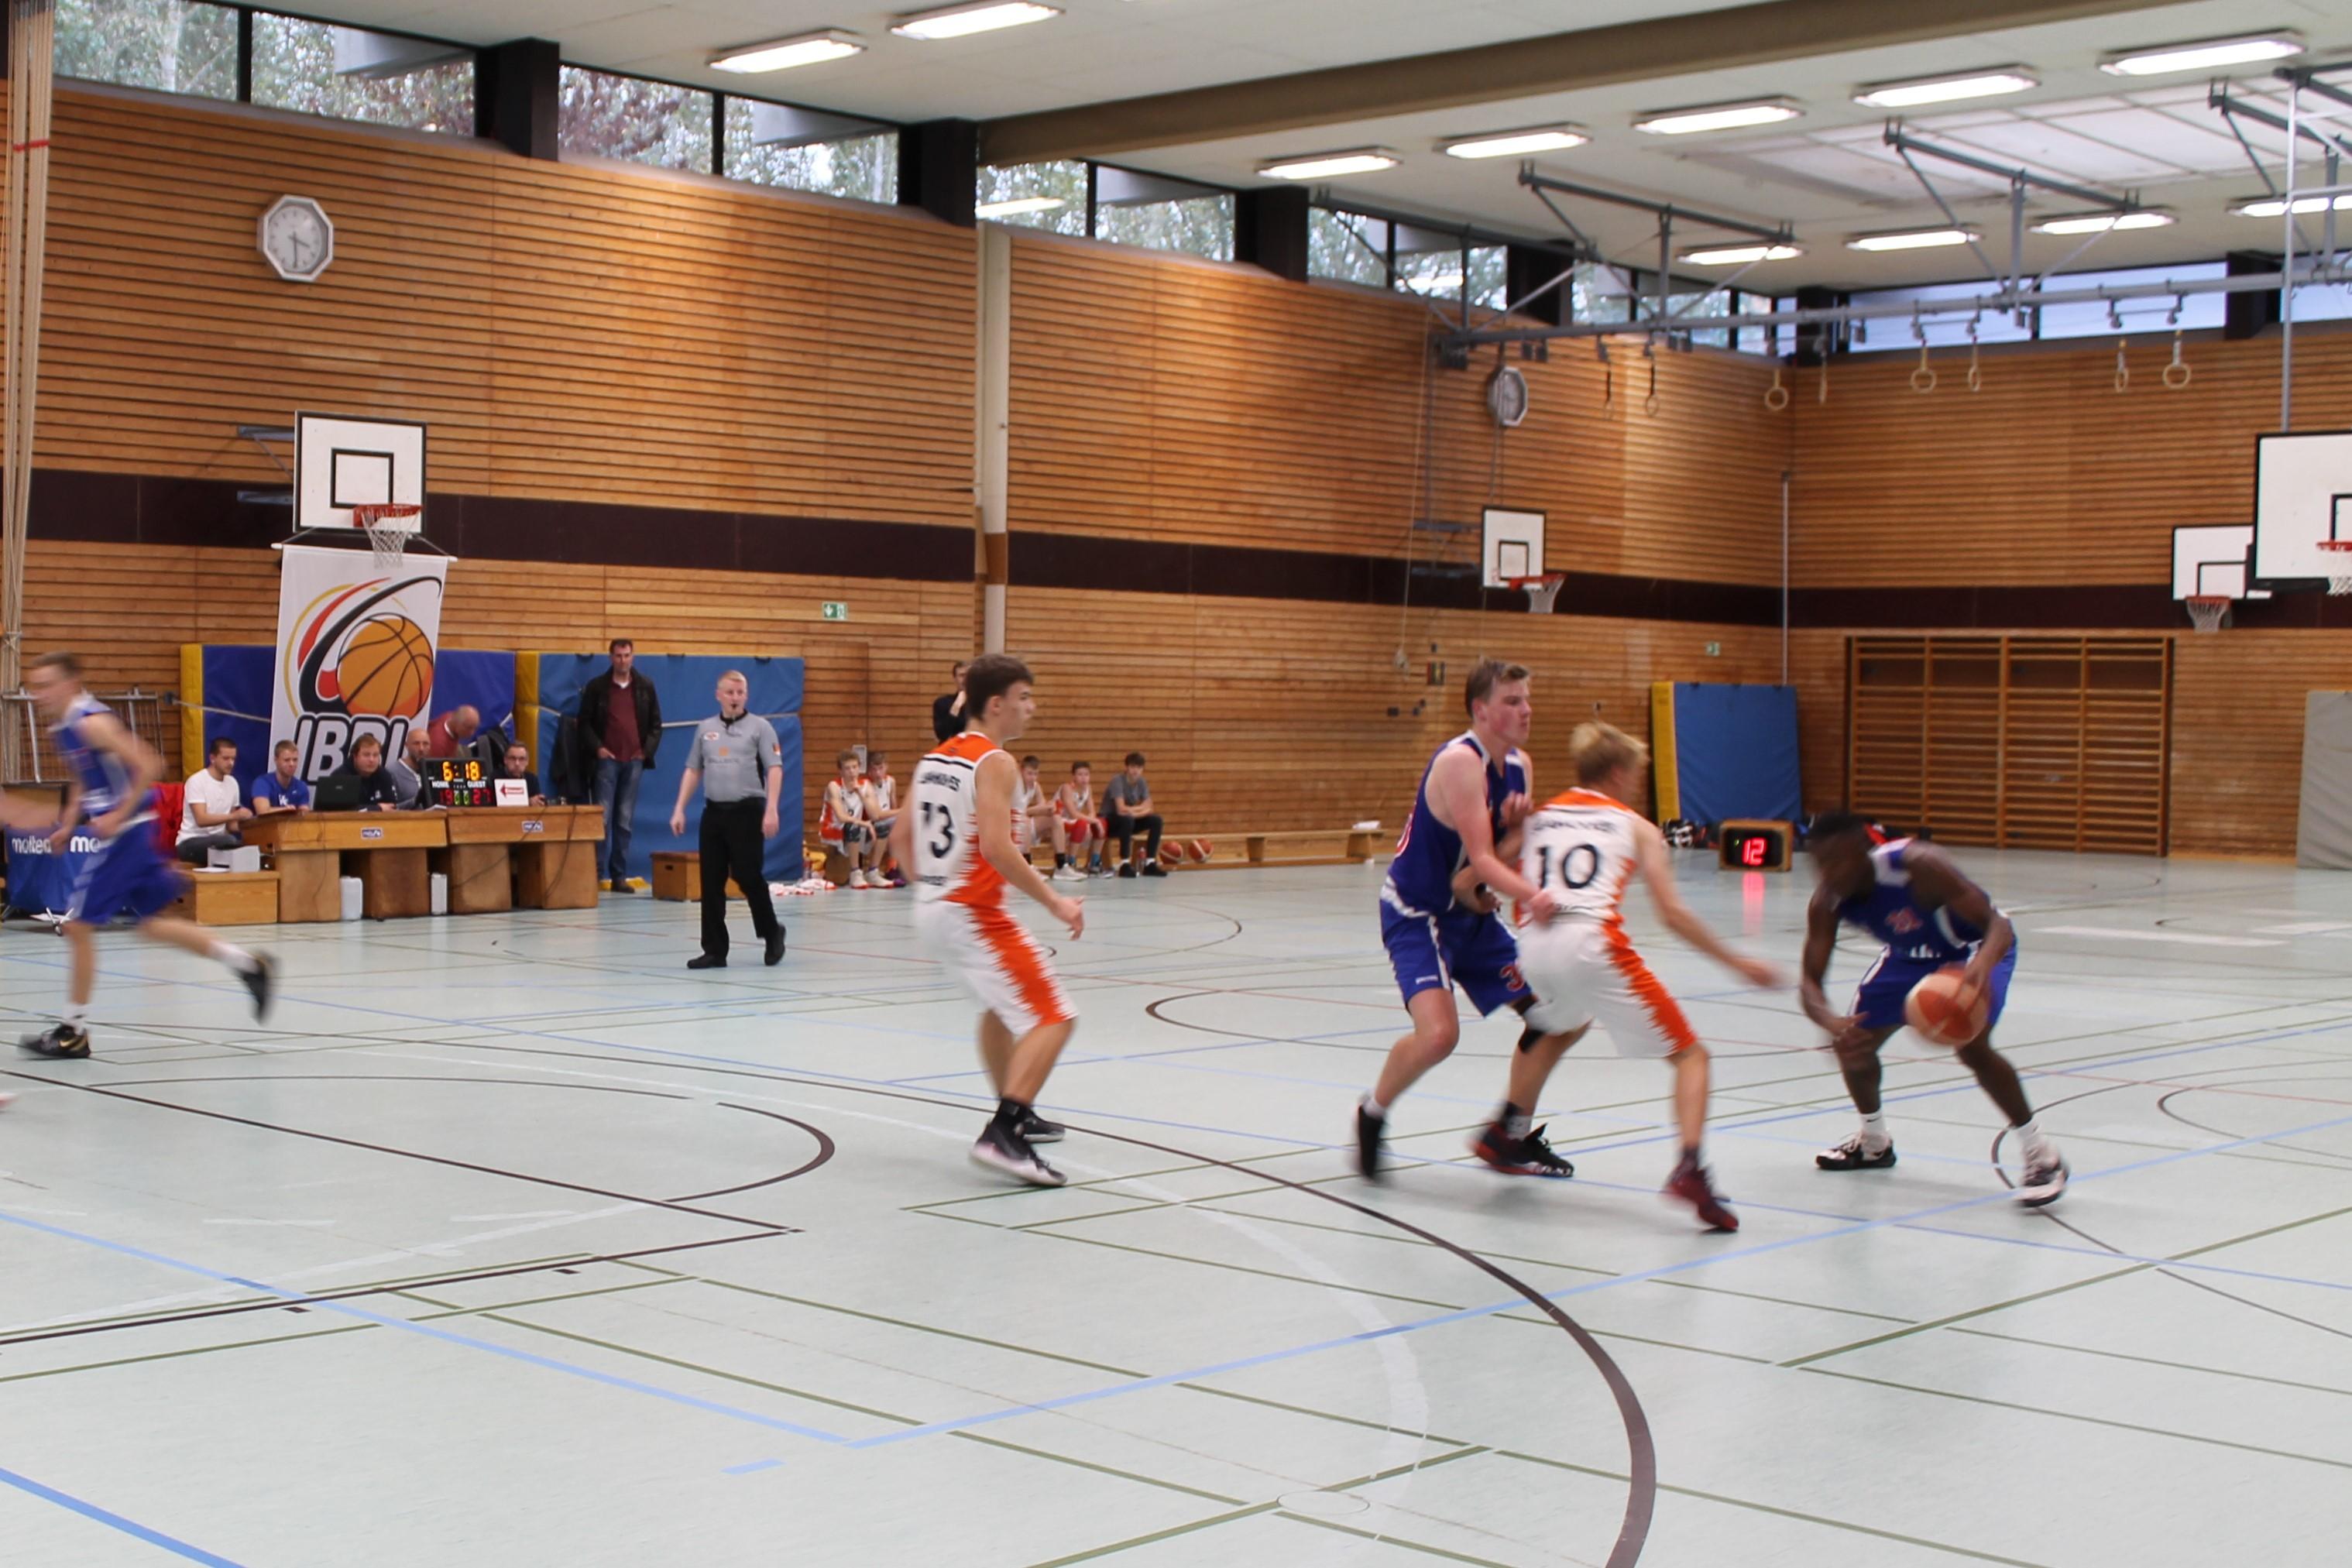 JBBL_19-20_BalticSeaLions_Rostock_Spieltag1_11azodiro_30wulf_pick_and_role